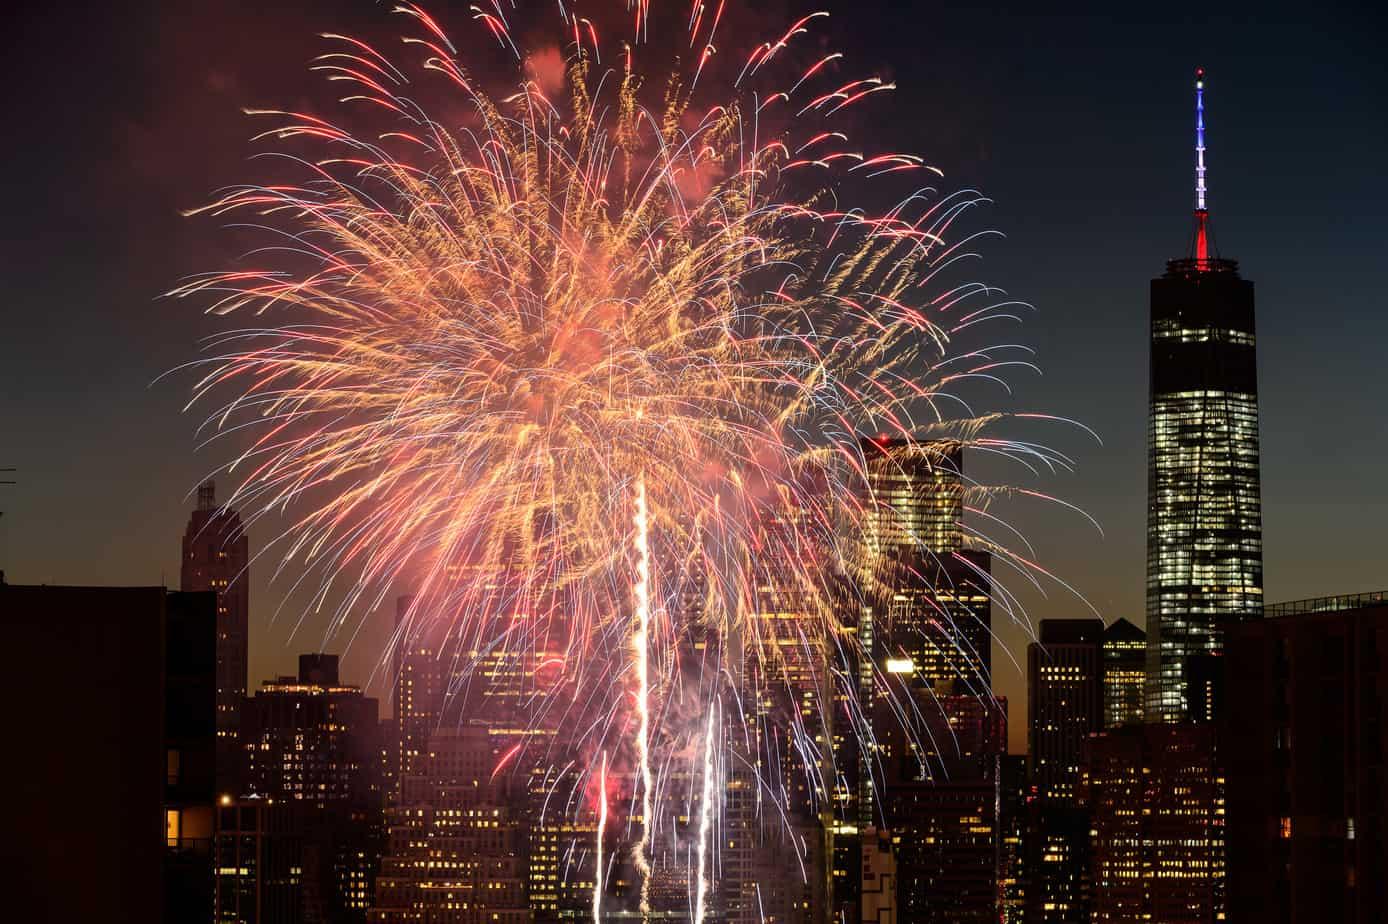 Kaboom Town - Addison, Texas Fireworks Show - 31Daily.com